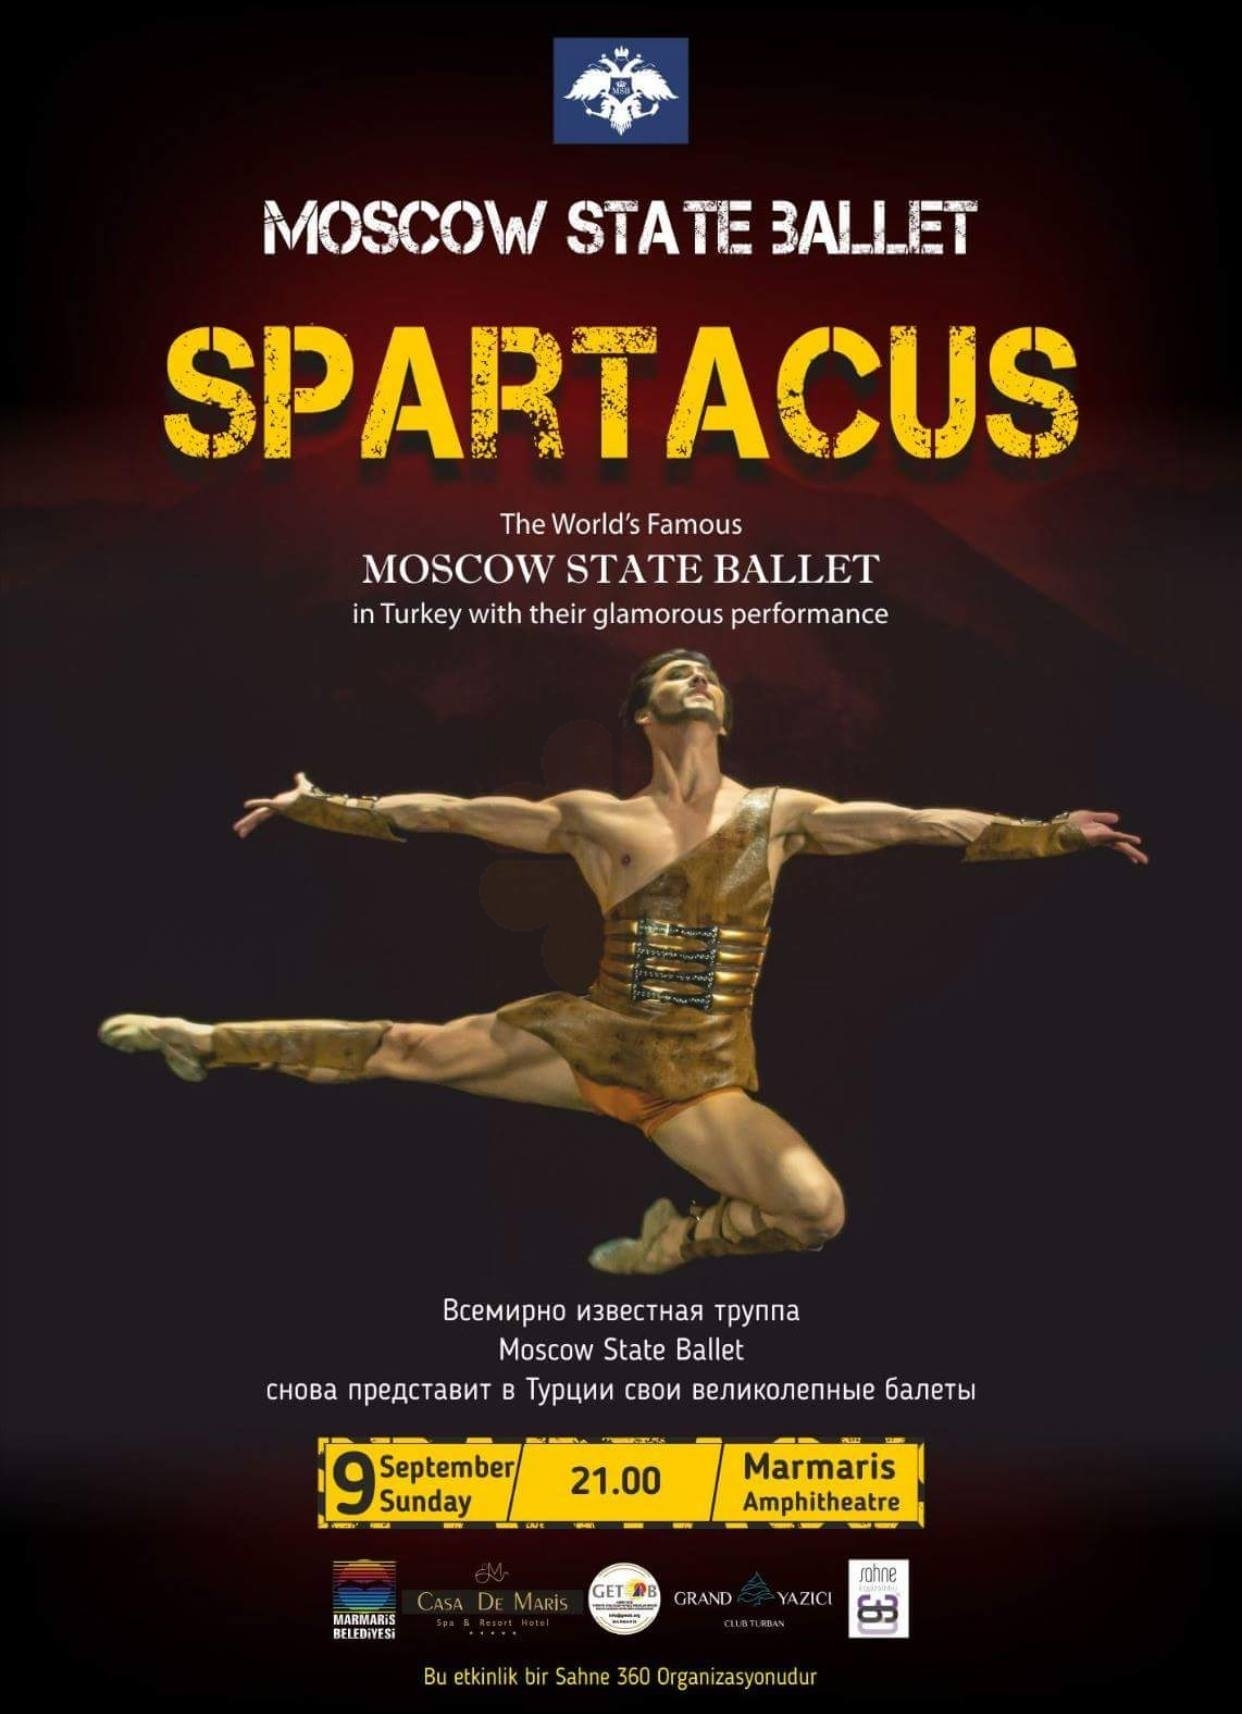 Balett Spartacus by Moscow State Balett